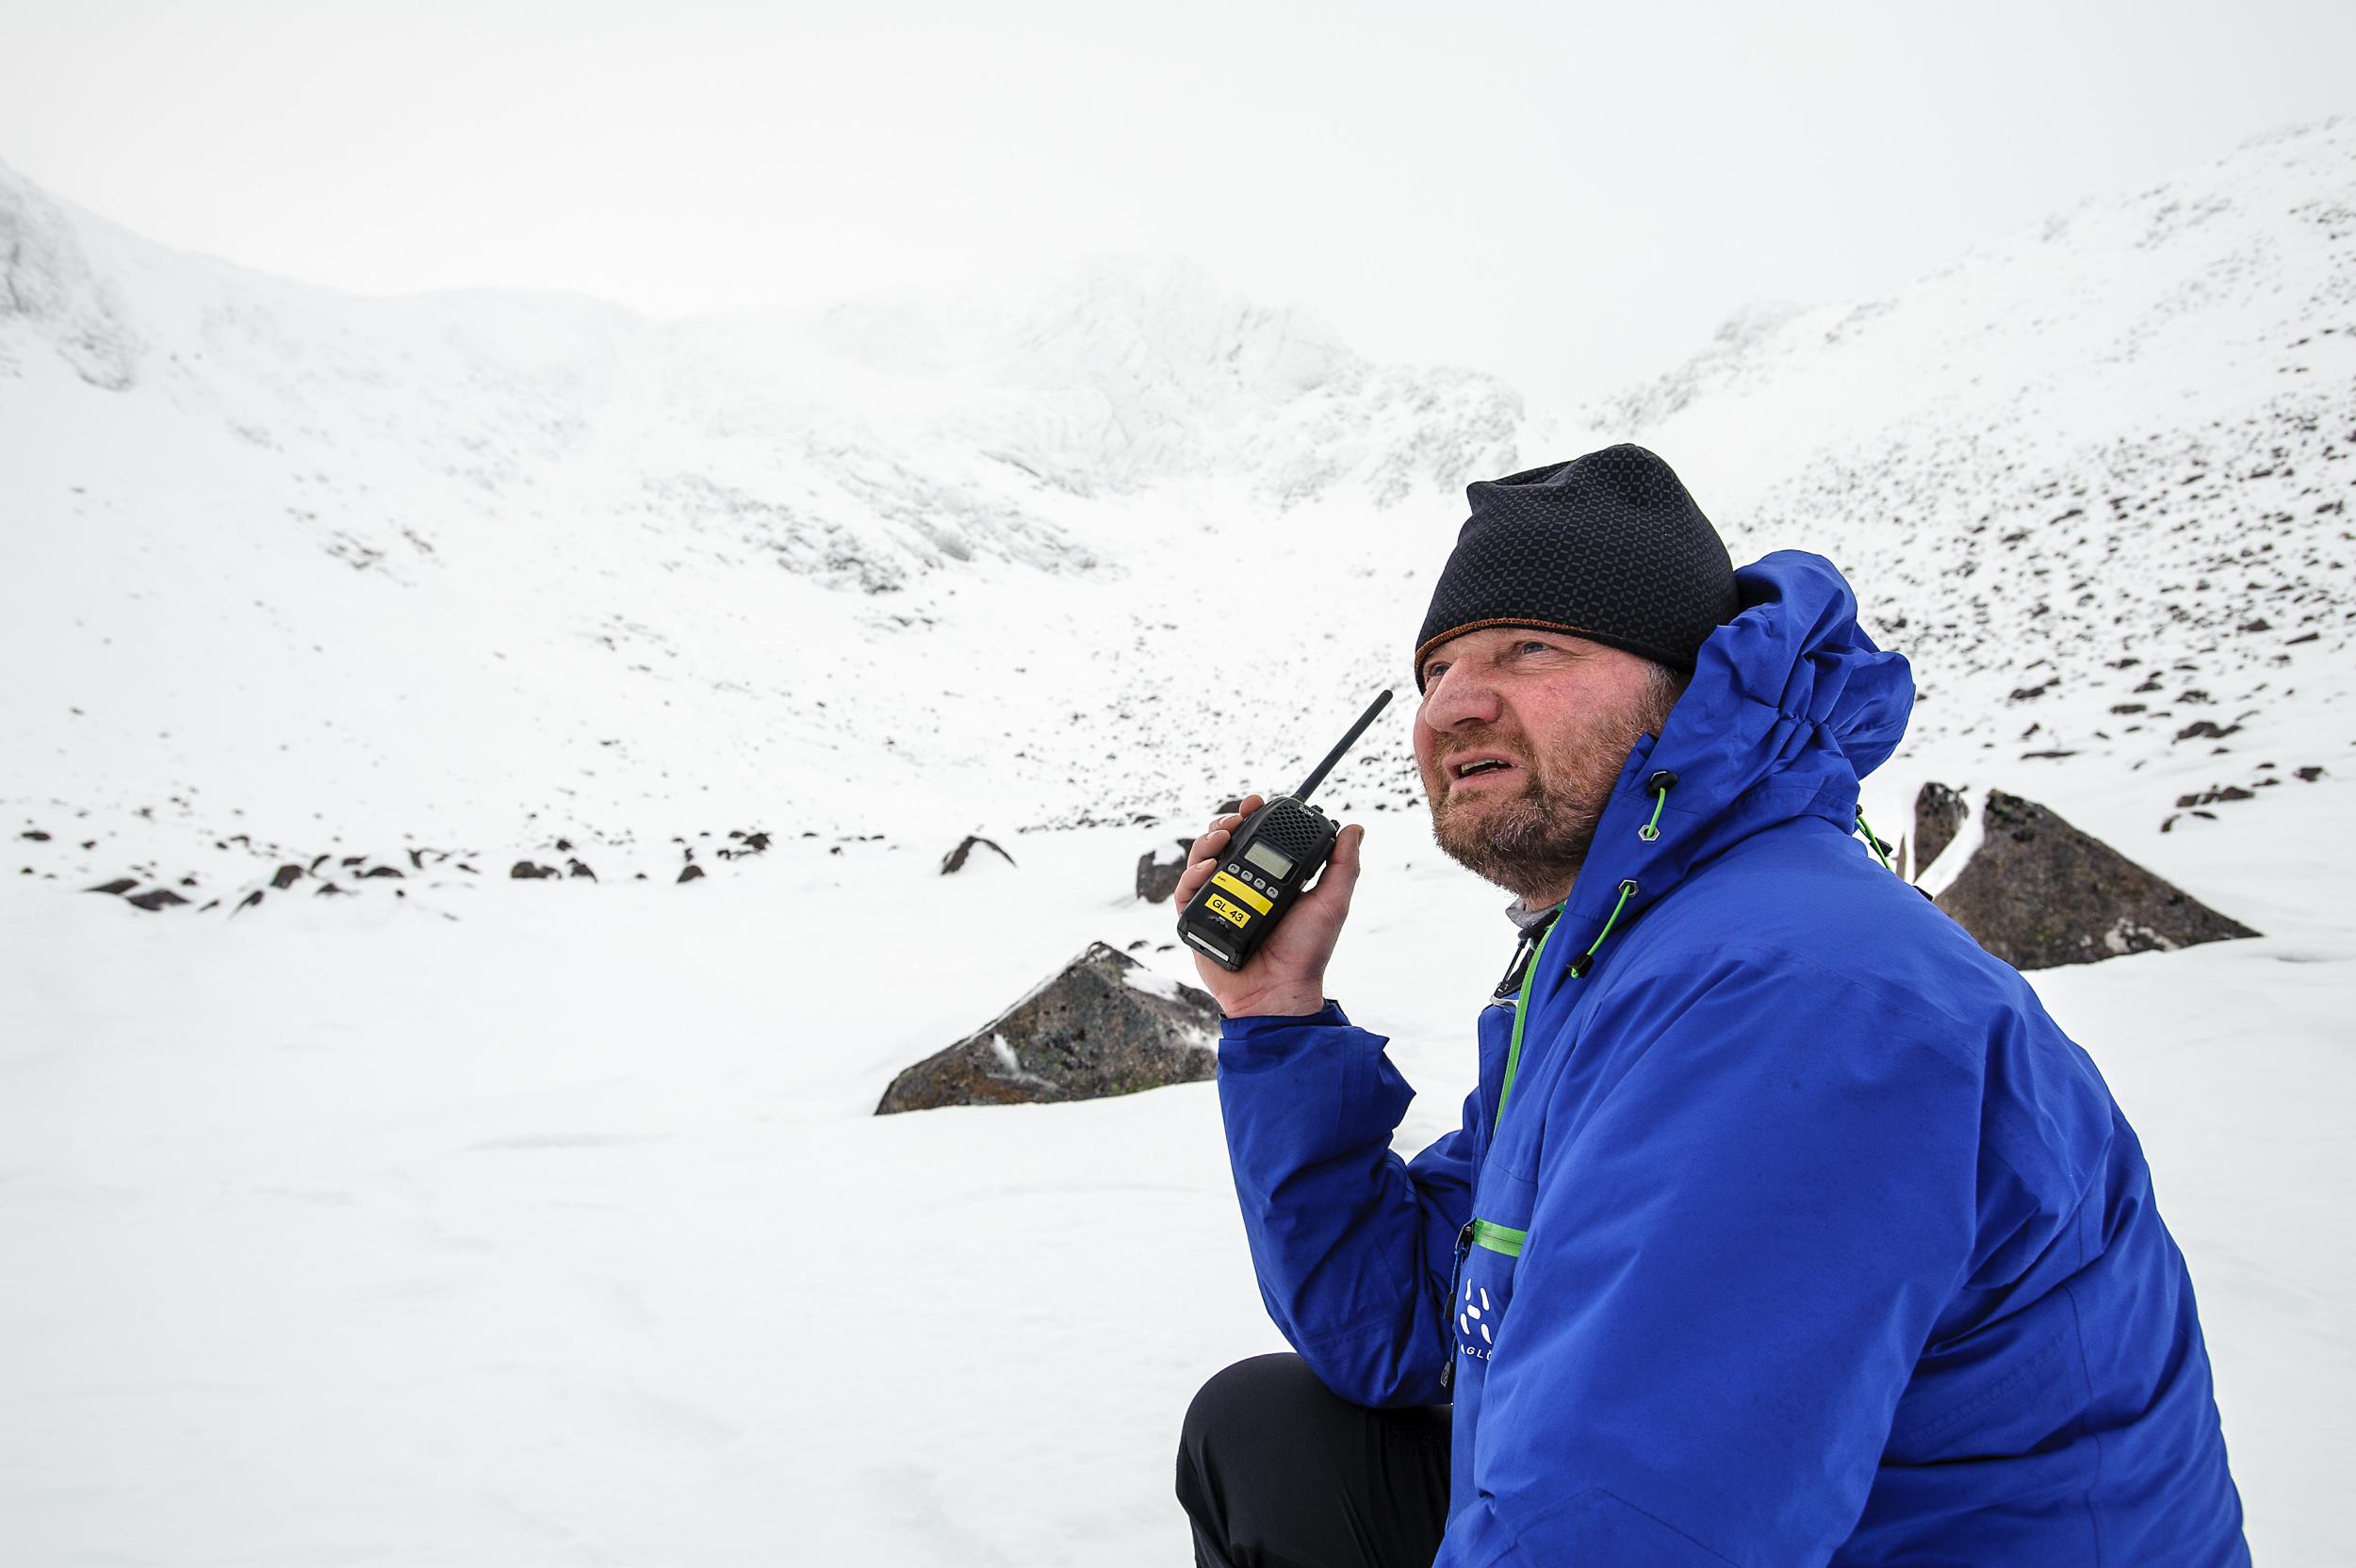 Mountain rescue - Scotland